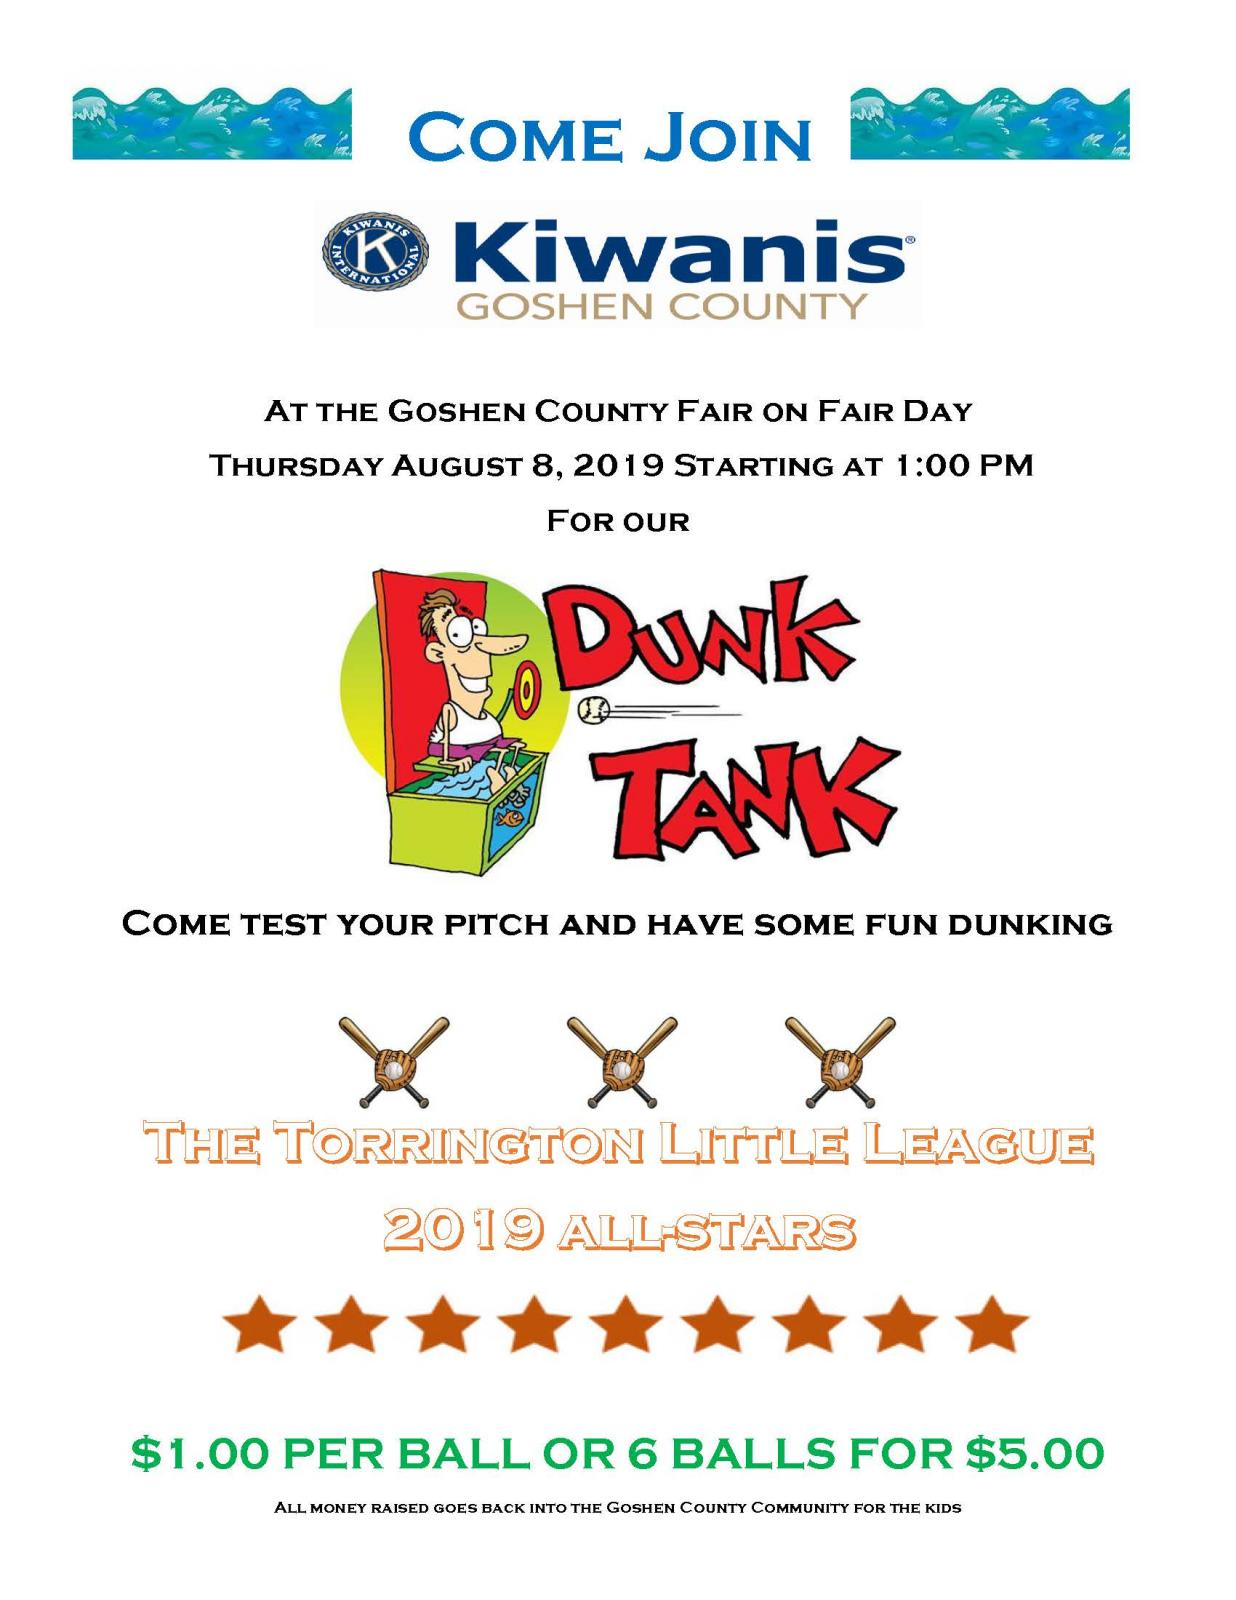 Kiwanis Dunk Tank at the Fair Photo